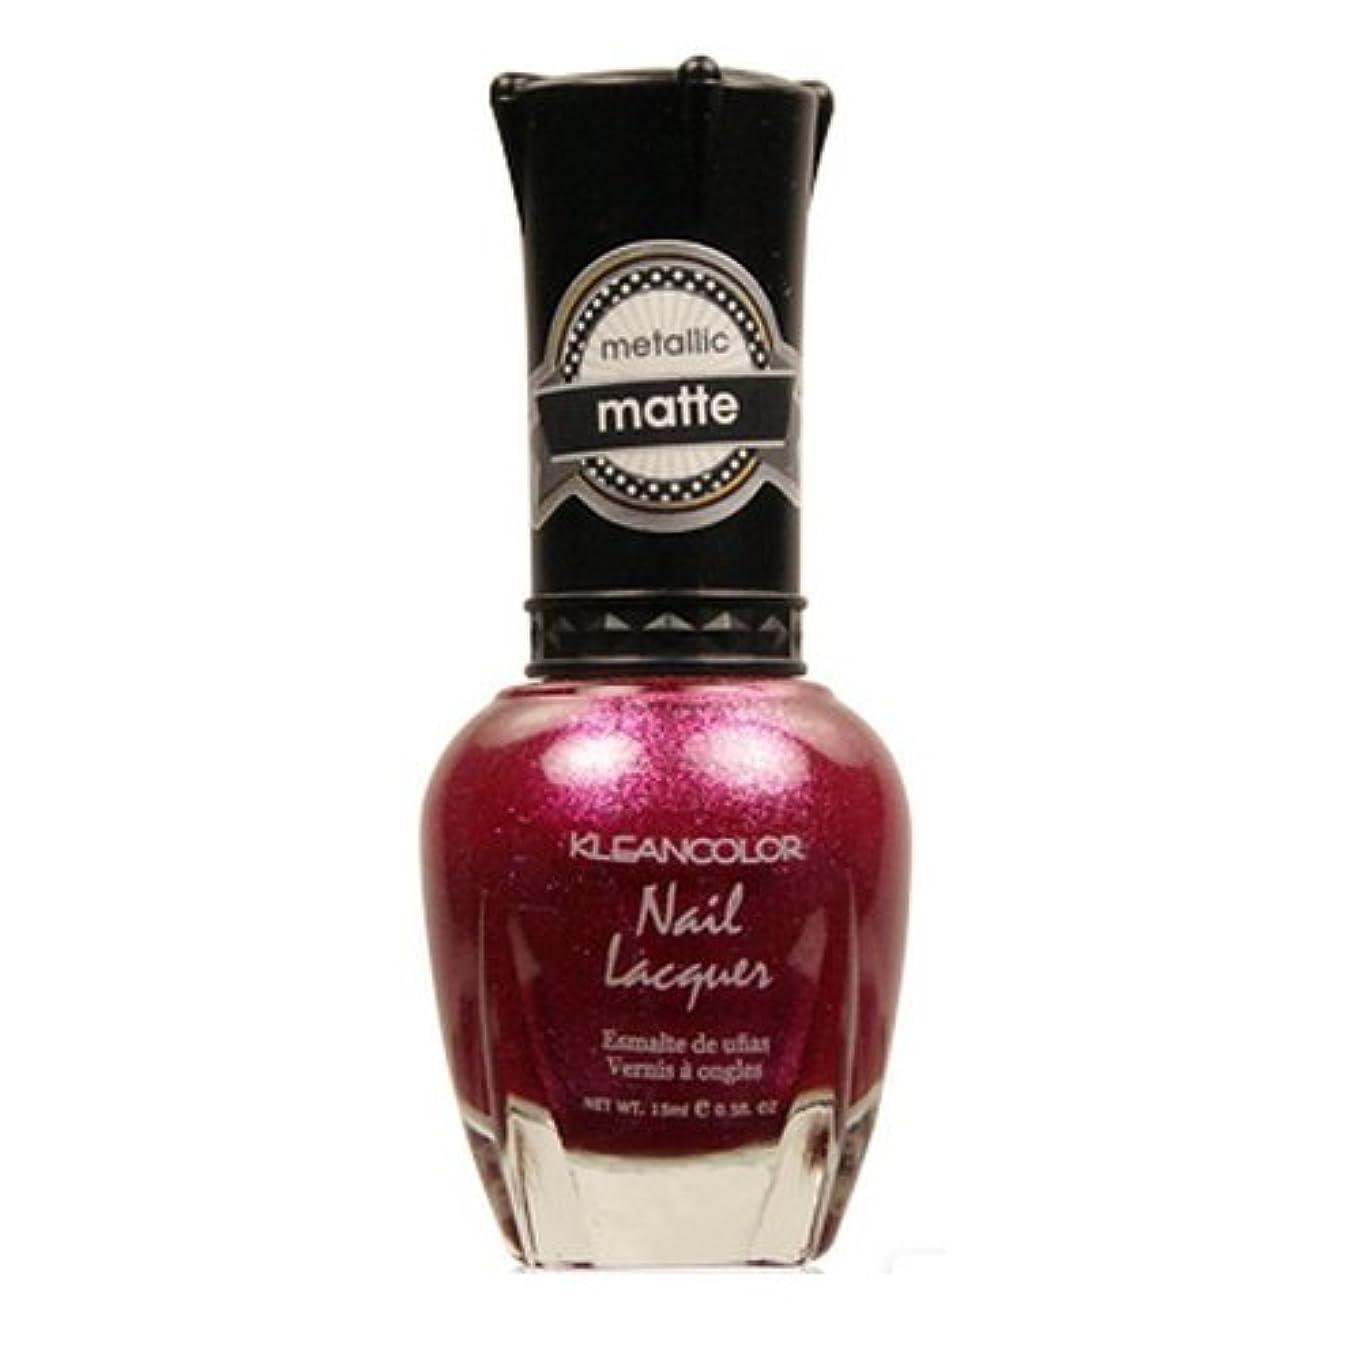 予防接種主観的職業(6 Pack) KLEANCOLOR Matte Nail Lacquer - Cast a Love Spell (並行輸入品)